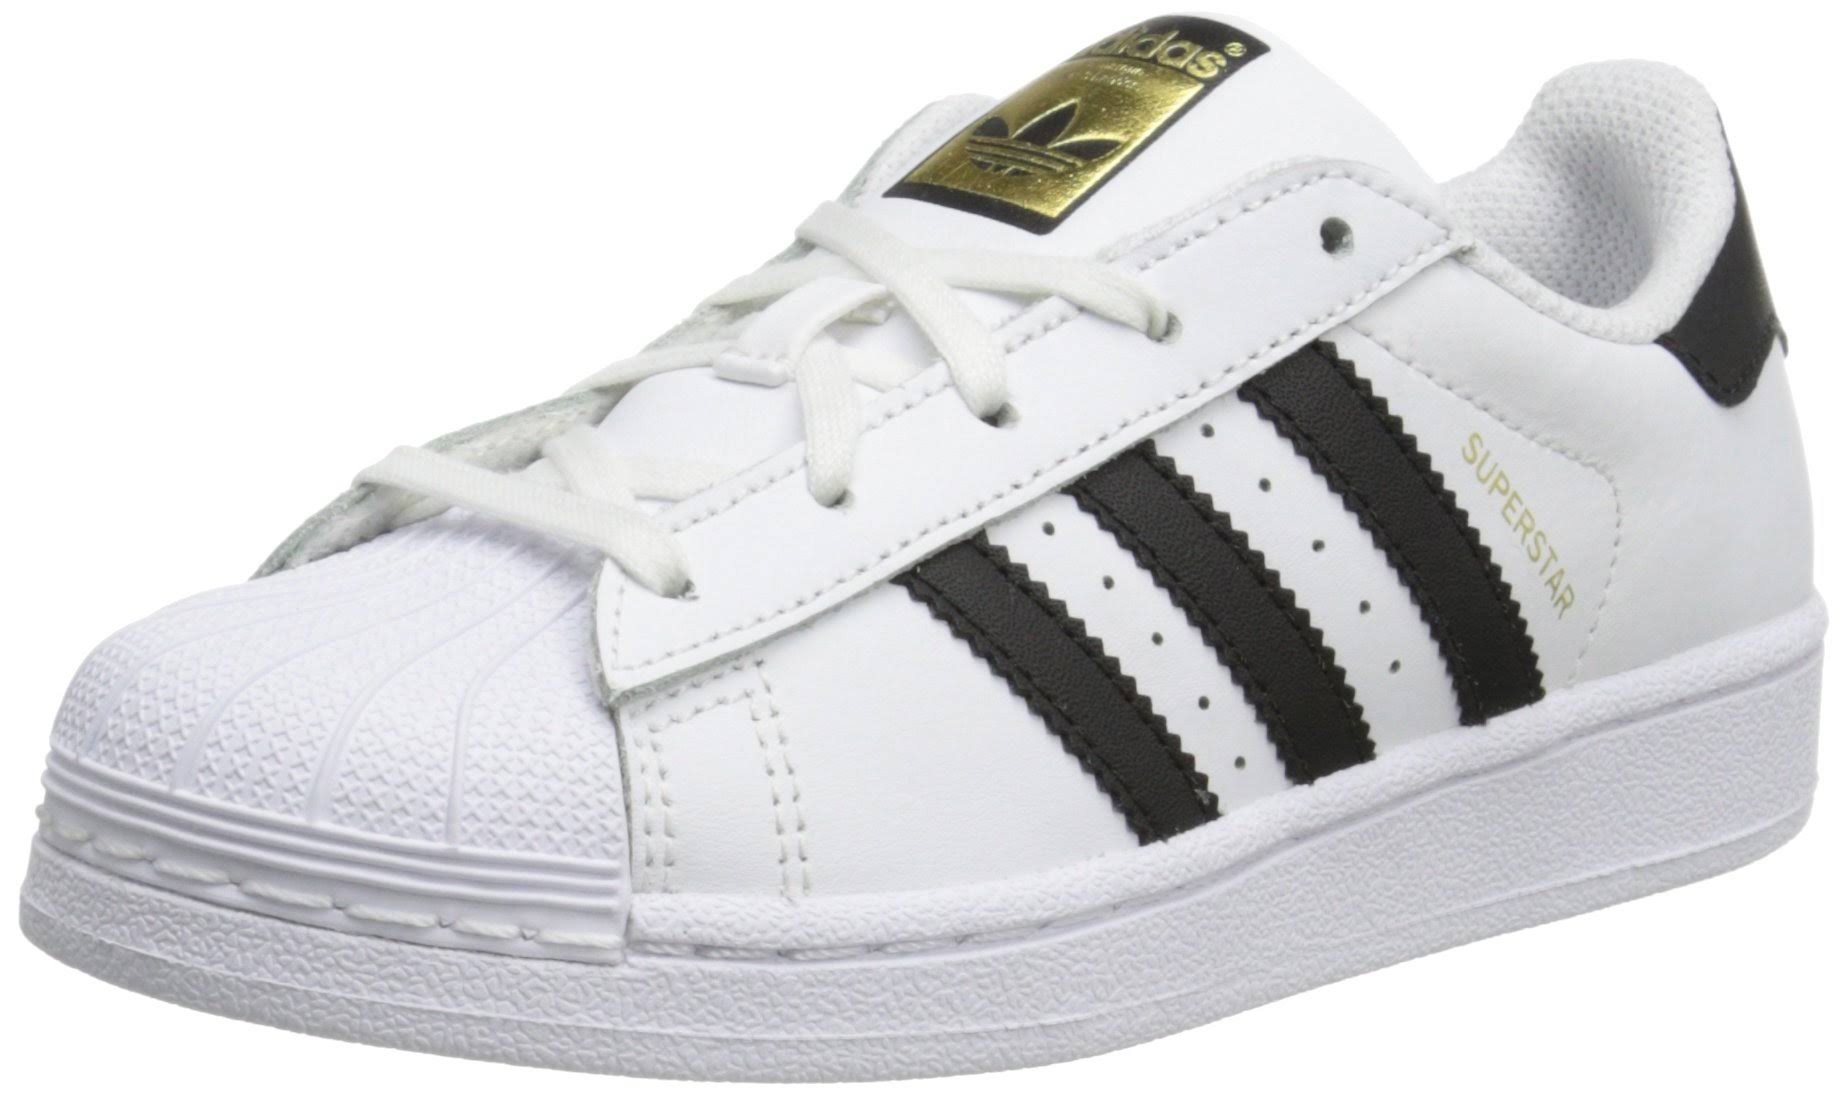 Superstar Little Superstar Adidas Adidas Little Kids Kids Adidas mN8n0w